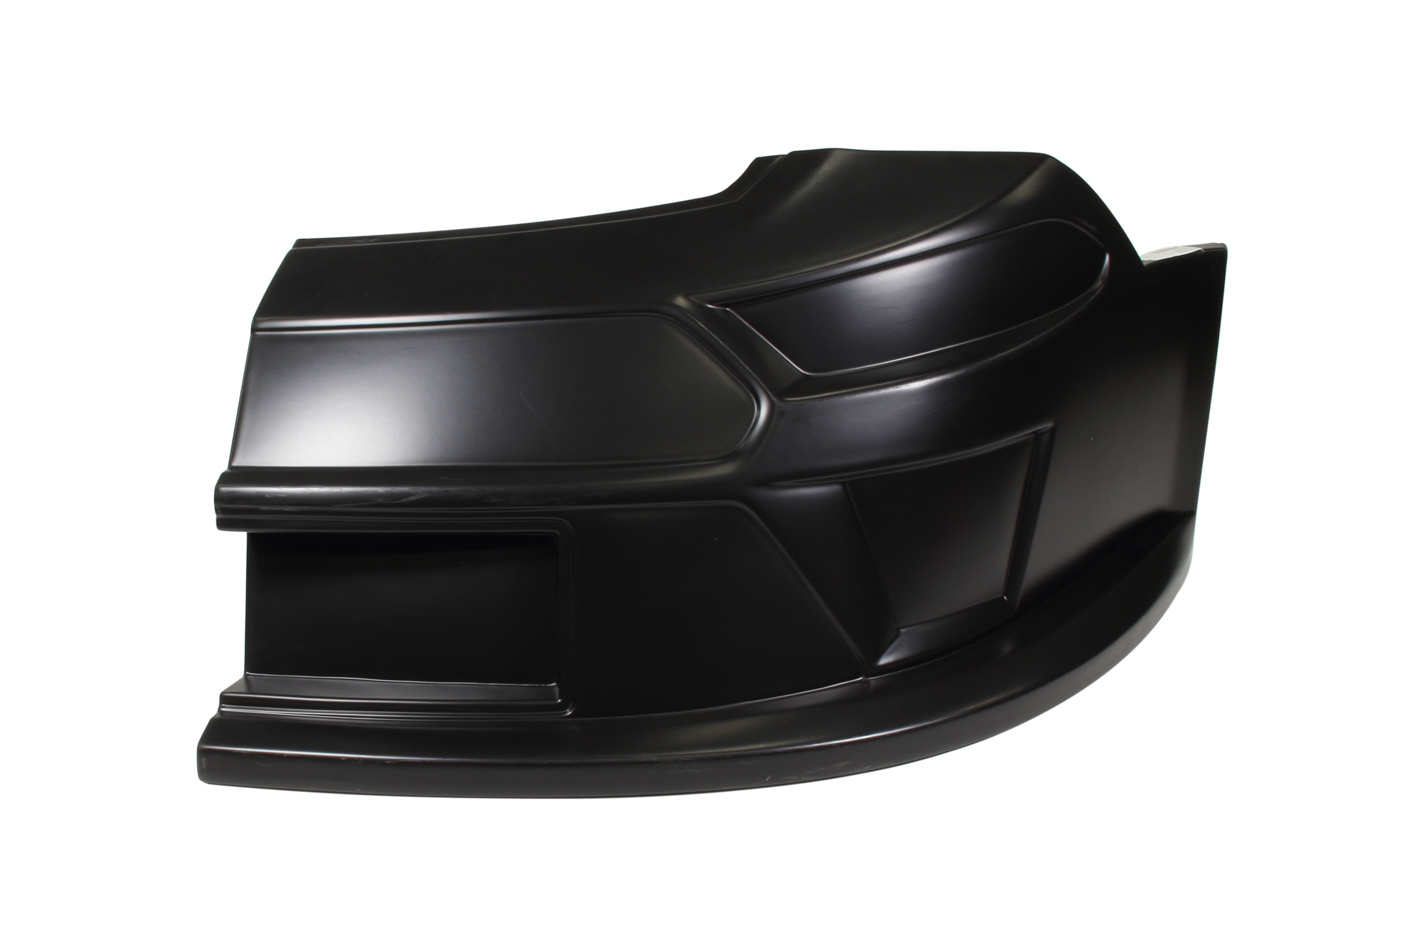 Fivestar 11322-41051-BL Nose, Driver Side, Molded Plastic, Black, Ford Mustang, 2019 Late Model, Each